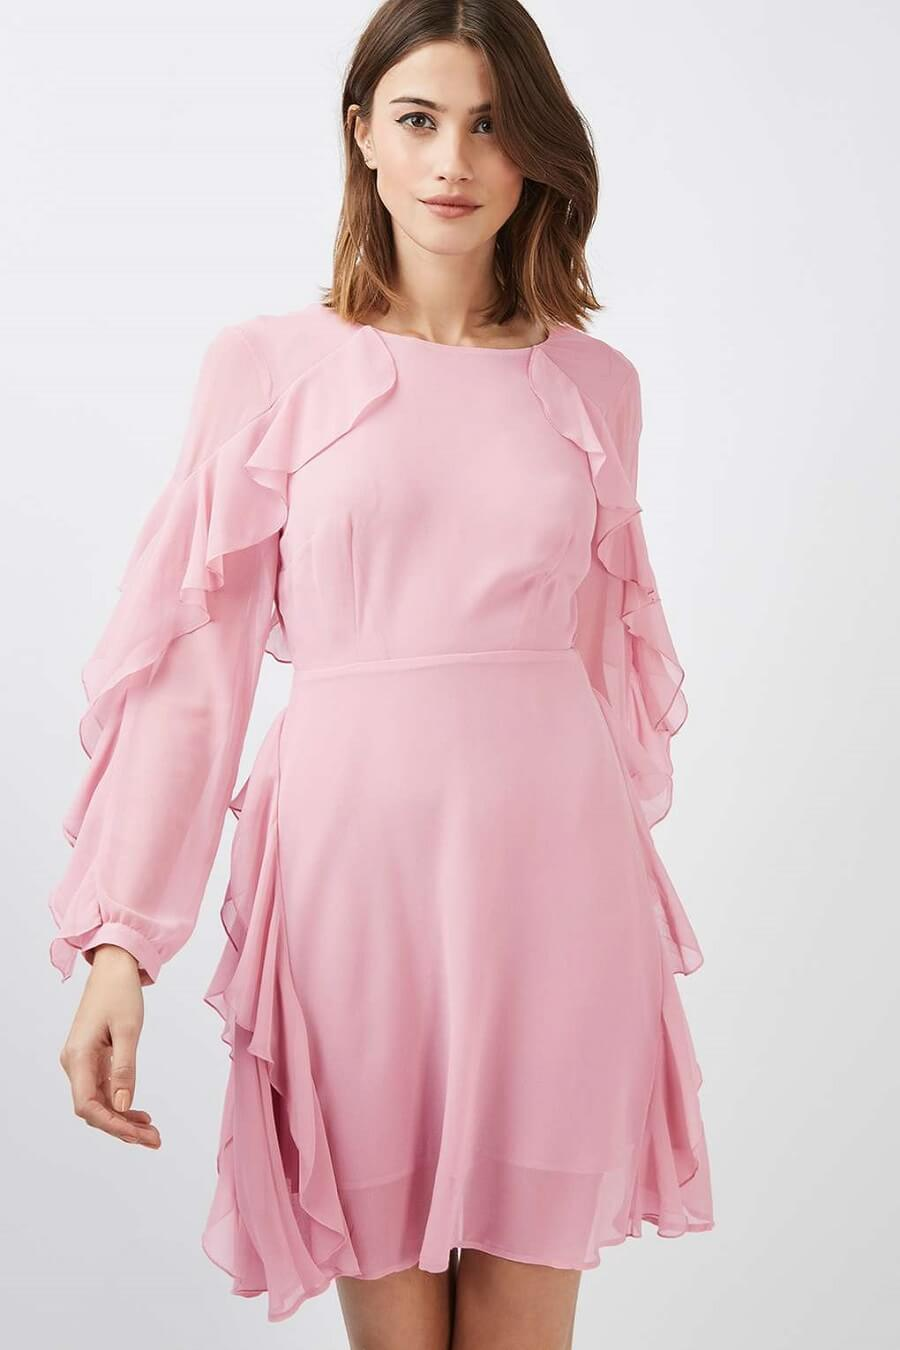 woman wearing a light pink frilly dress